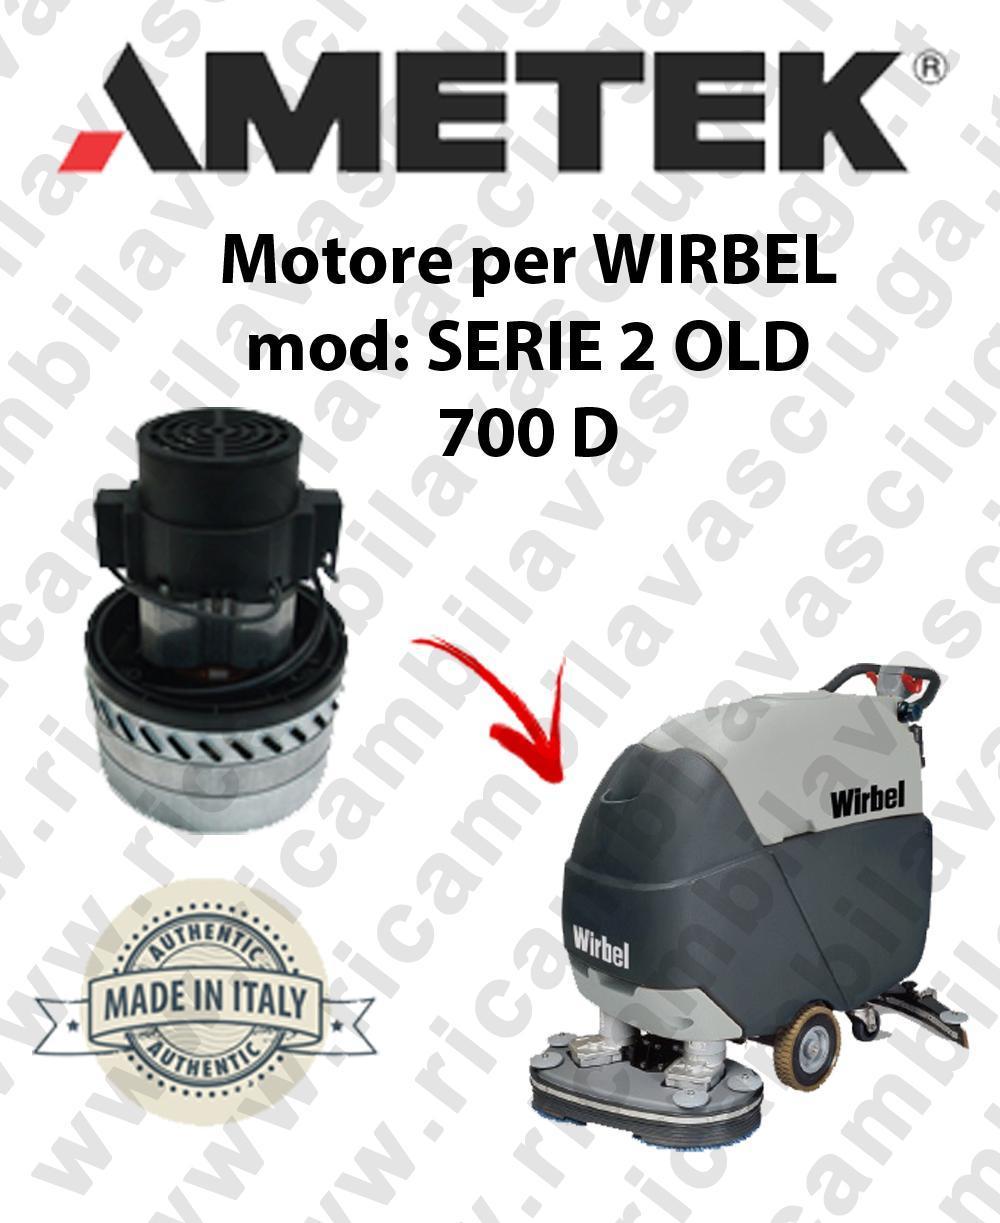 SERIE 2 OLD 700 D Motore de aspiración AMETEK para fregadora WIRBEL